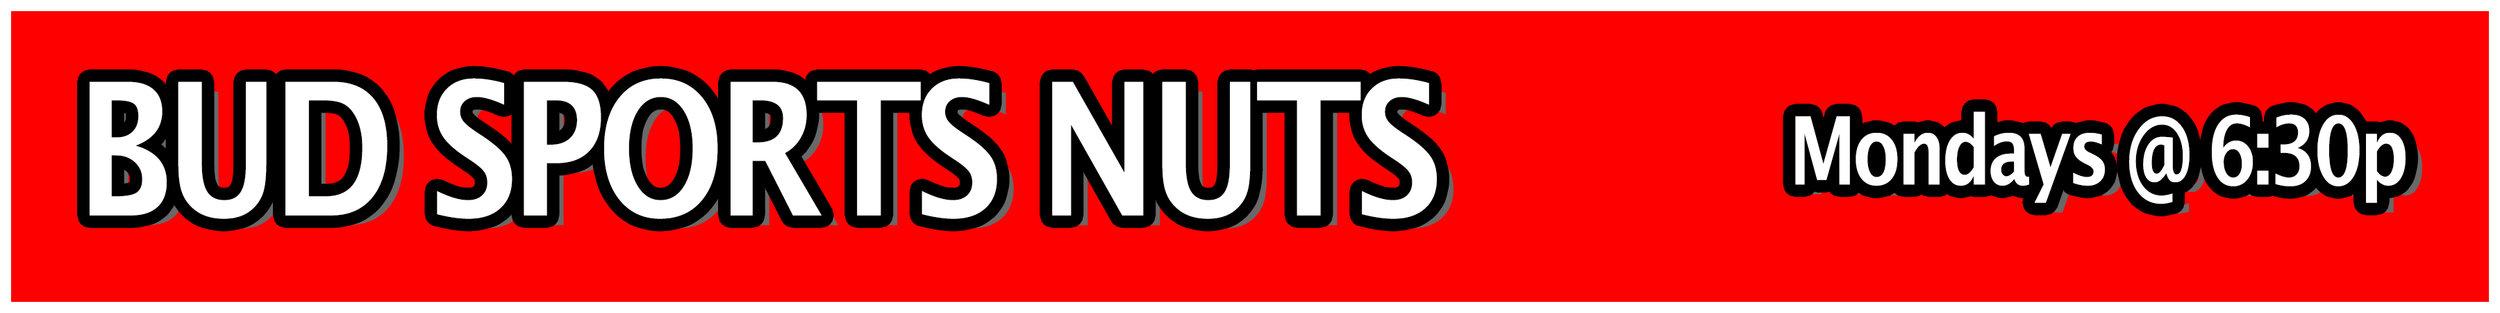 LS Banners- Bud Sports Nuts.jpg